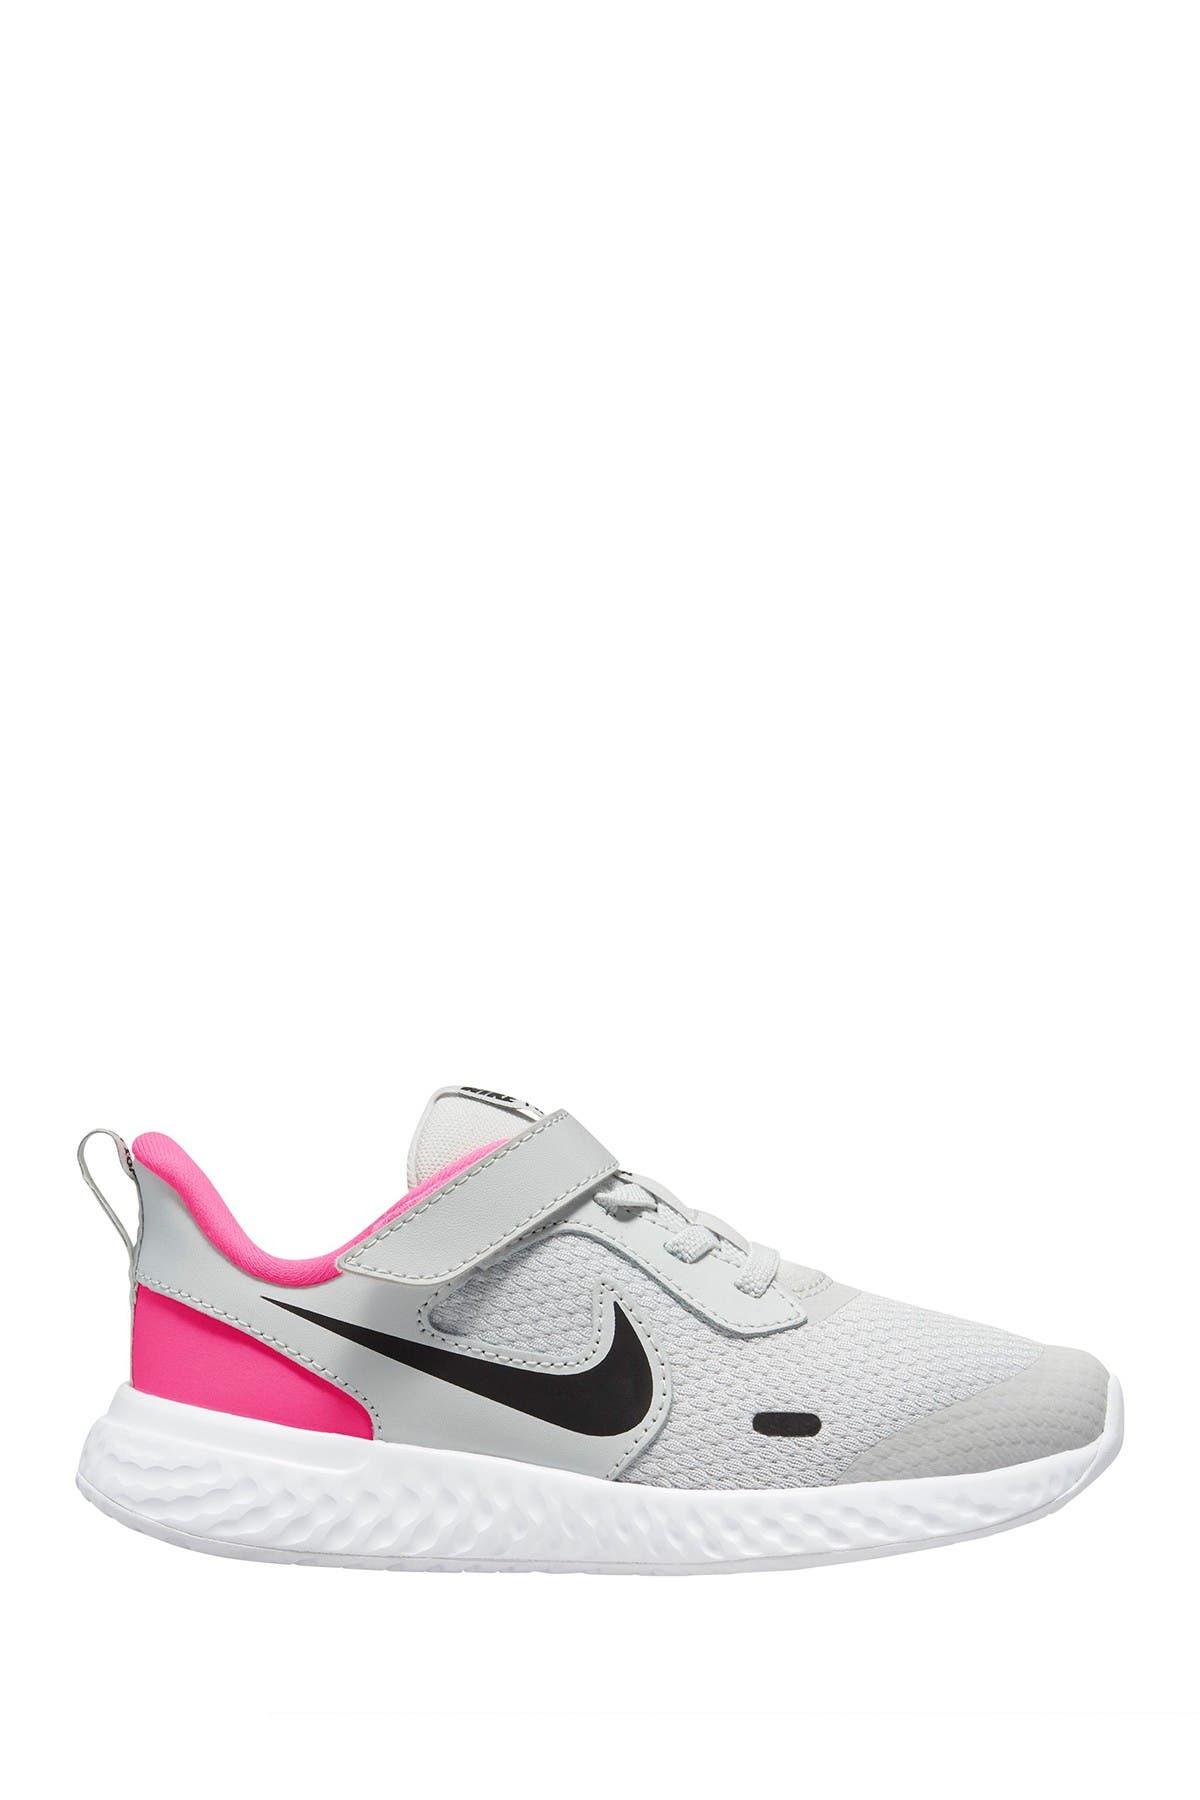 Nike Kids' Girls' Shoes   Nordstrom Rack